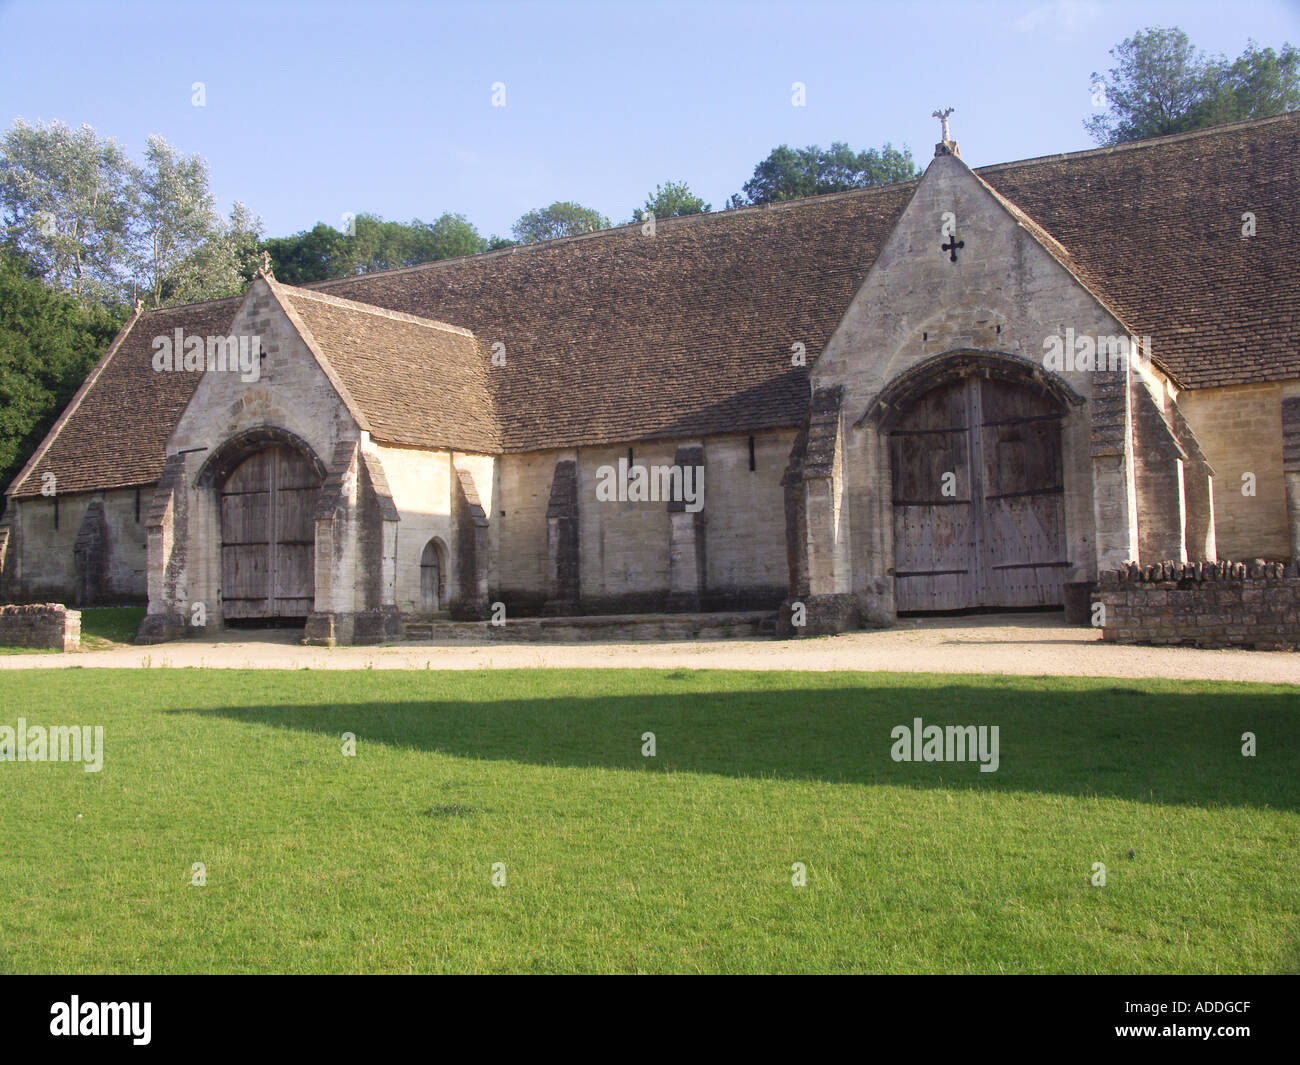 Fourteenth century tithe barn Bradford on Avon Wiltshire England - Stock Image